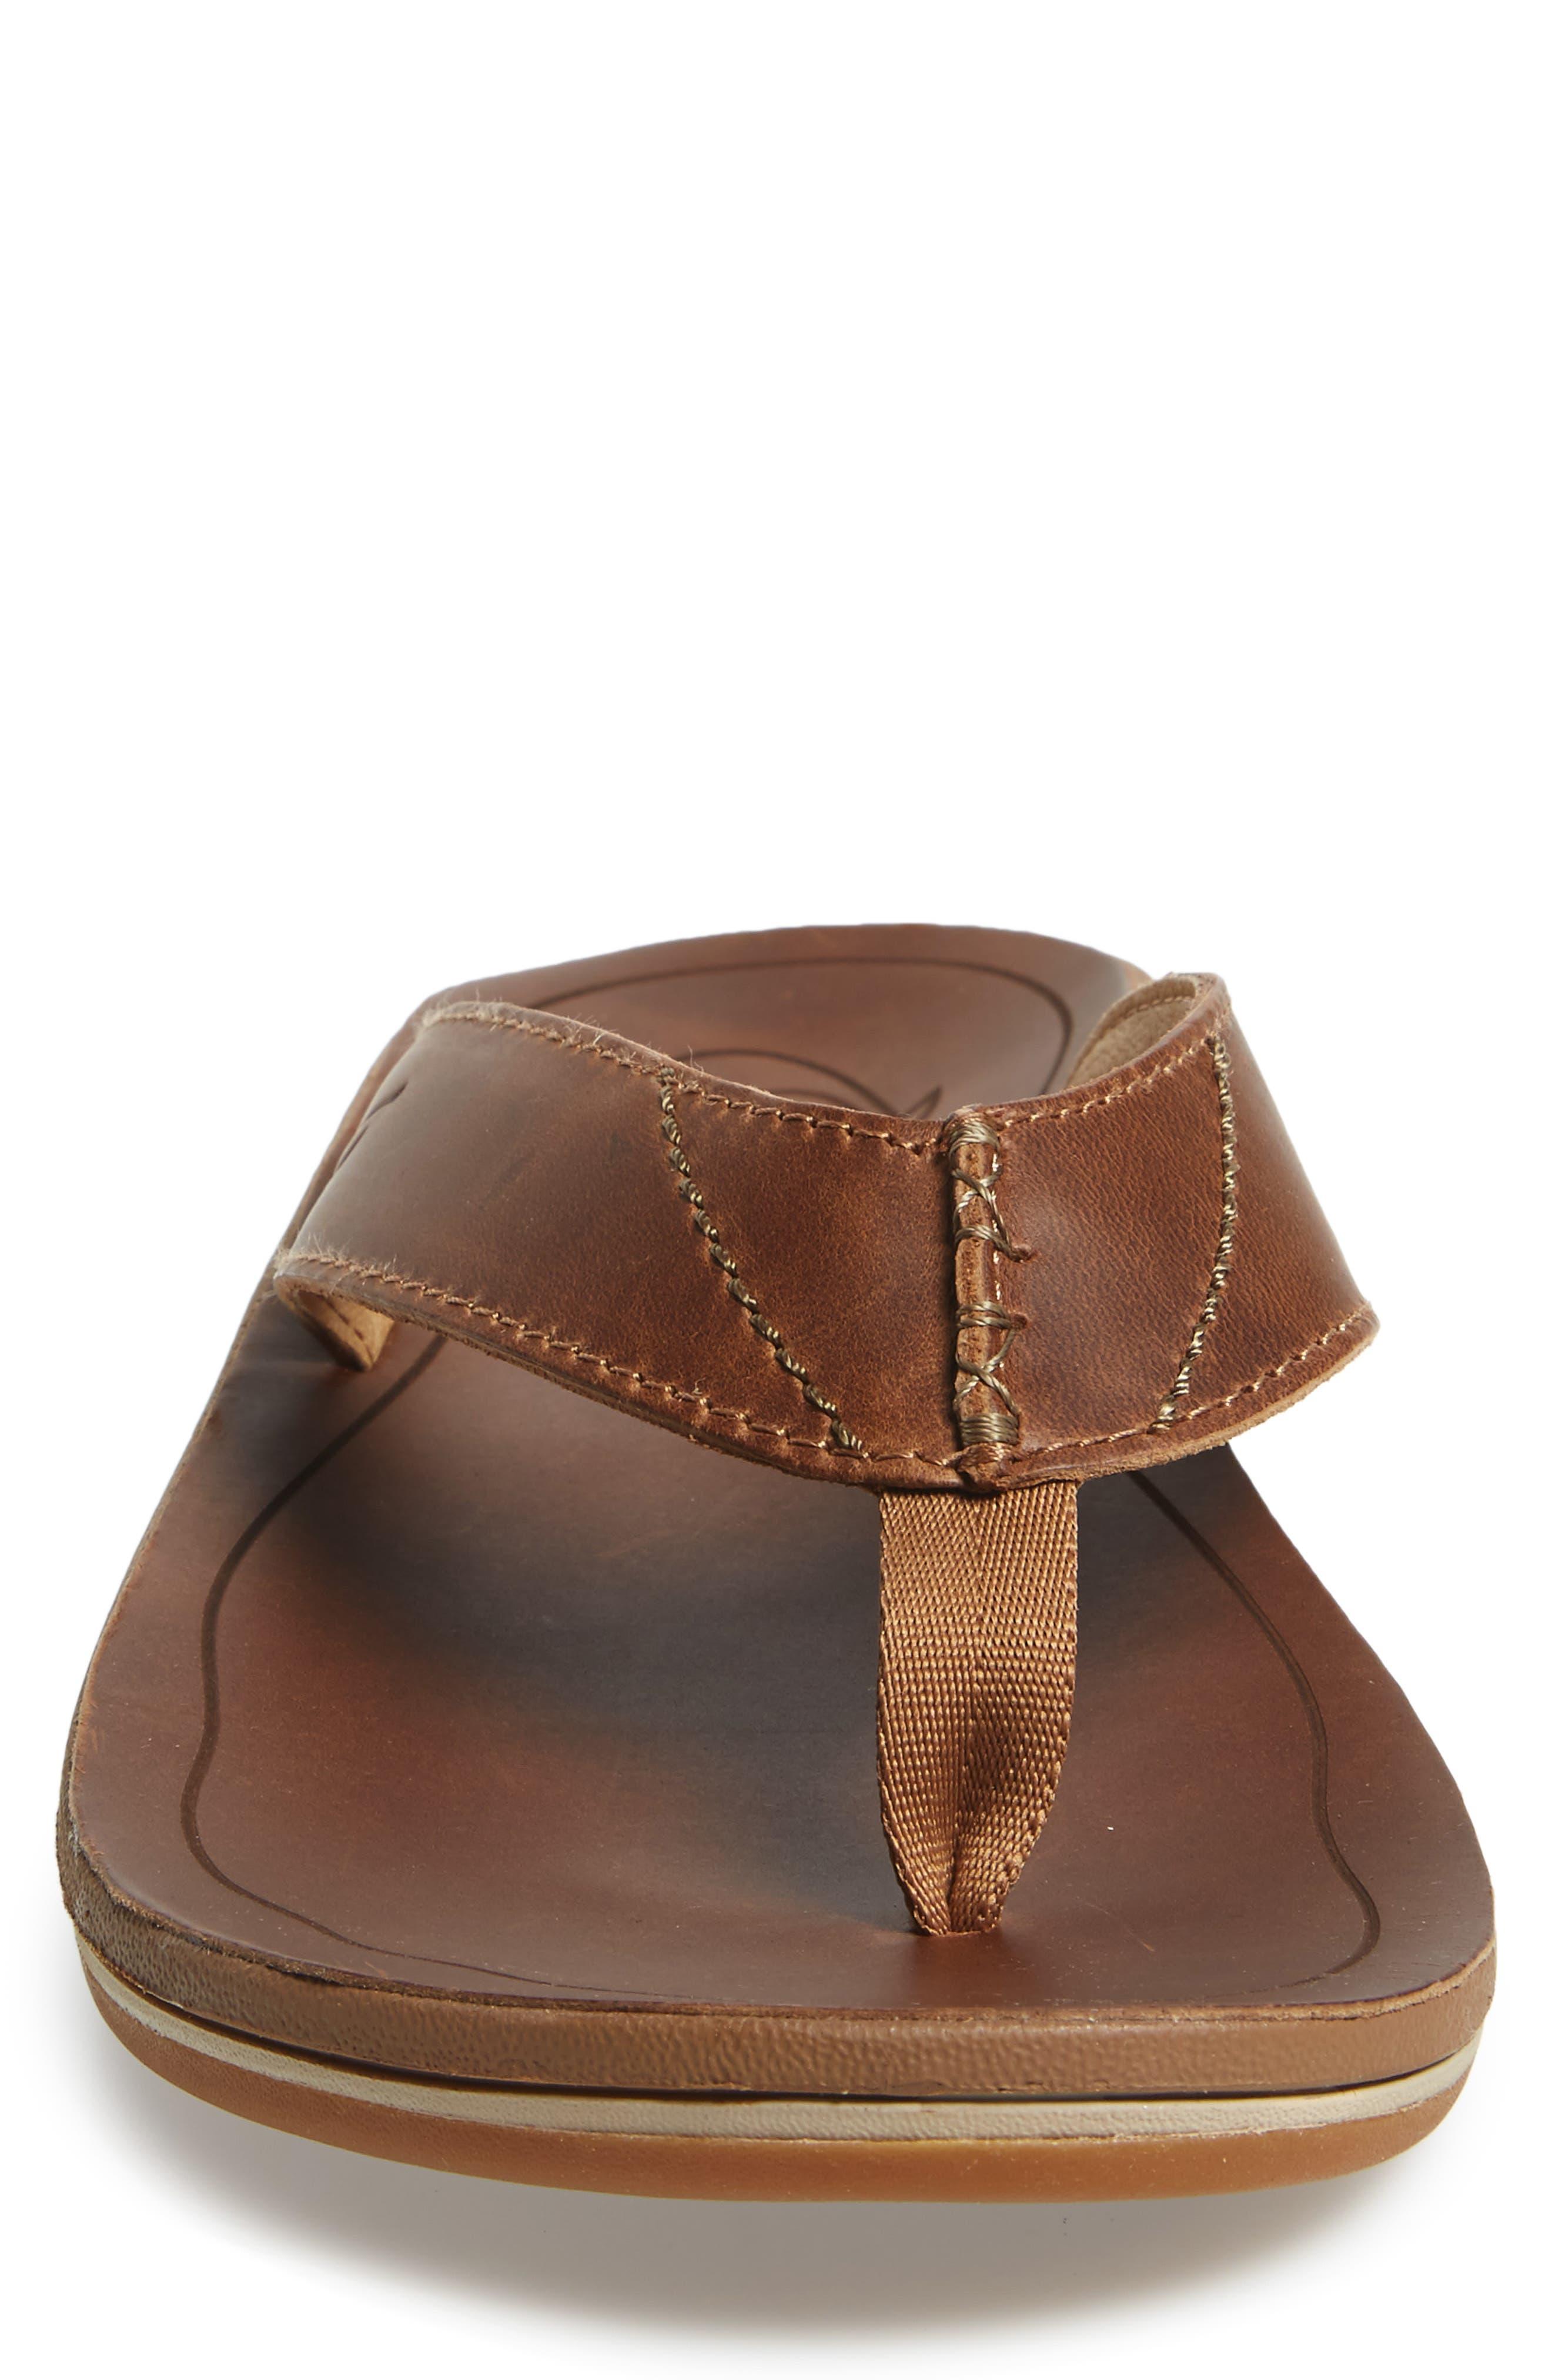 9781cd7888e2 Olukai Nohona Ili Flip Flop In Tan  Tan Leather